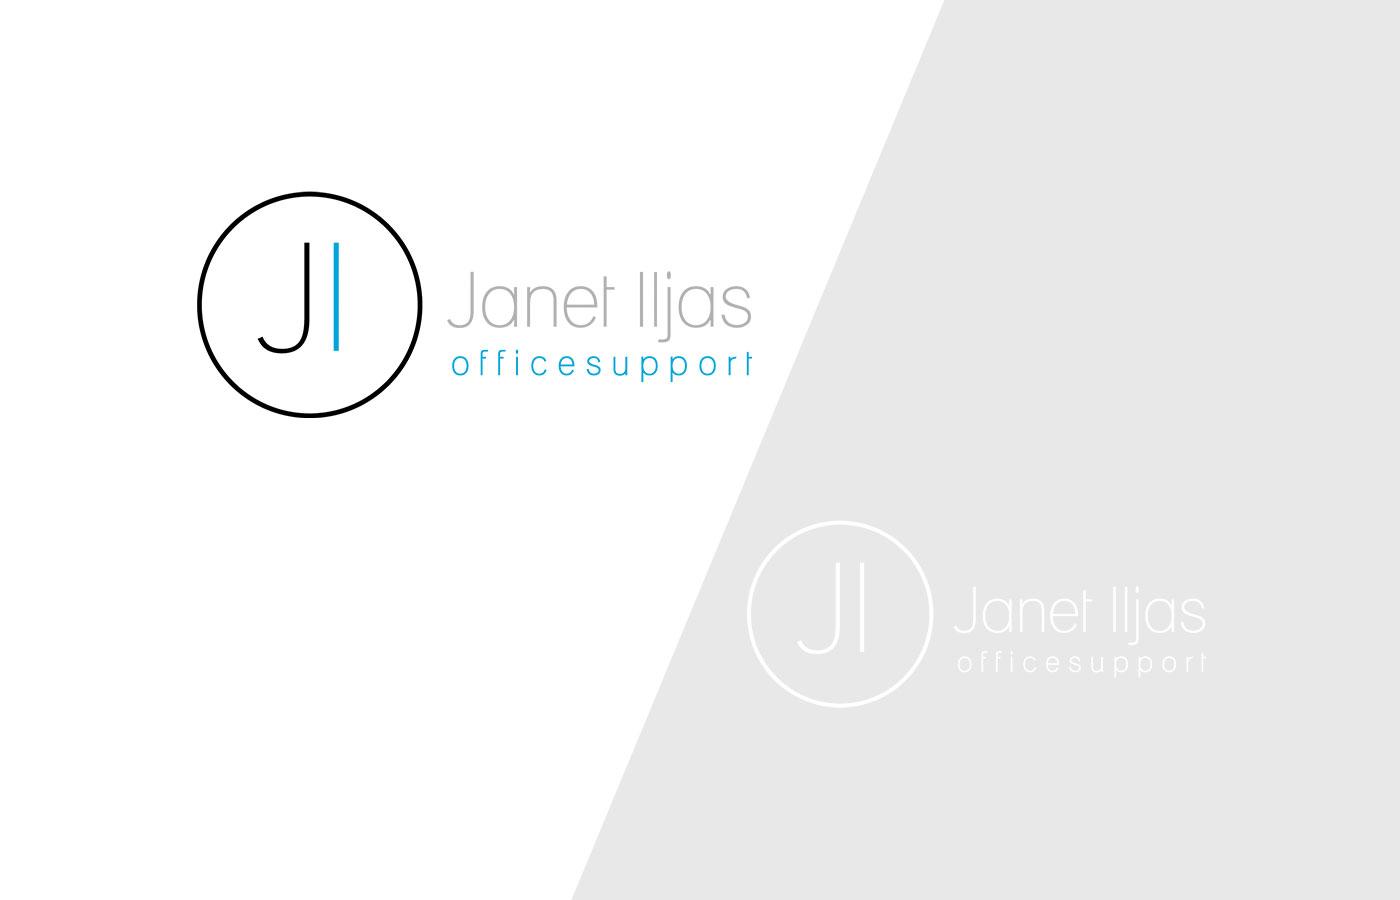 logo janet iljas officesupport